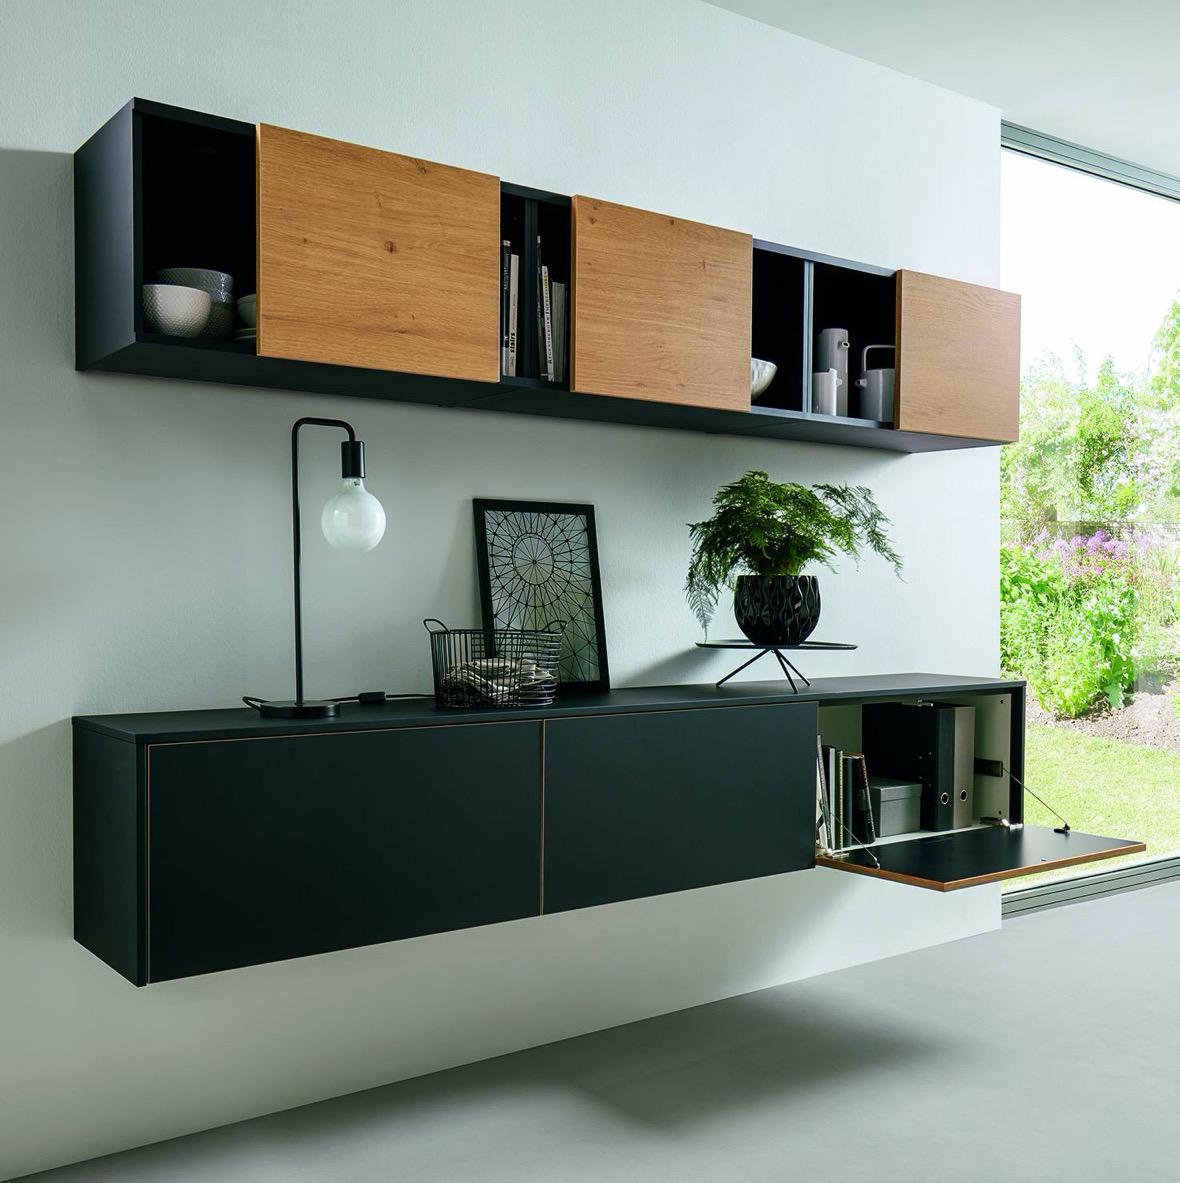 meubles de complements cuisines aviva